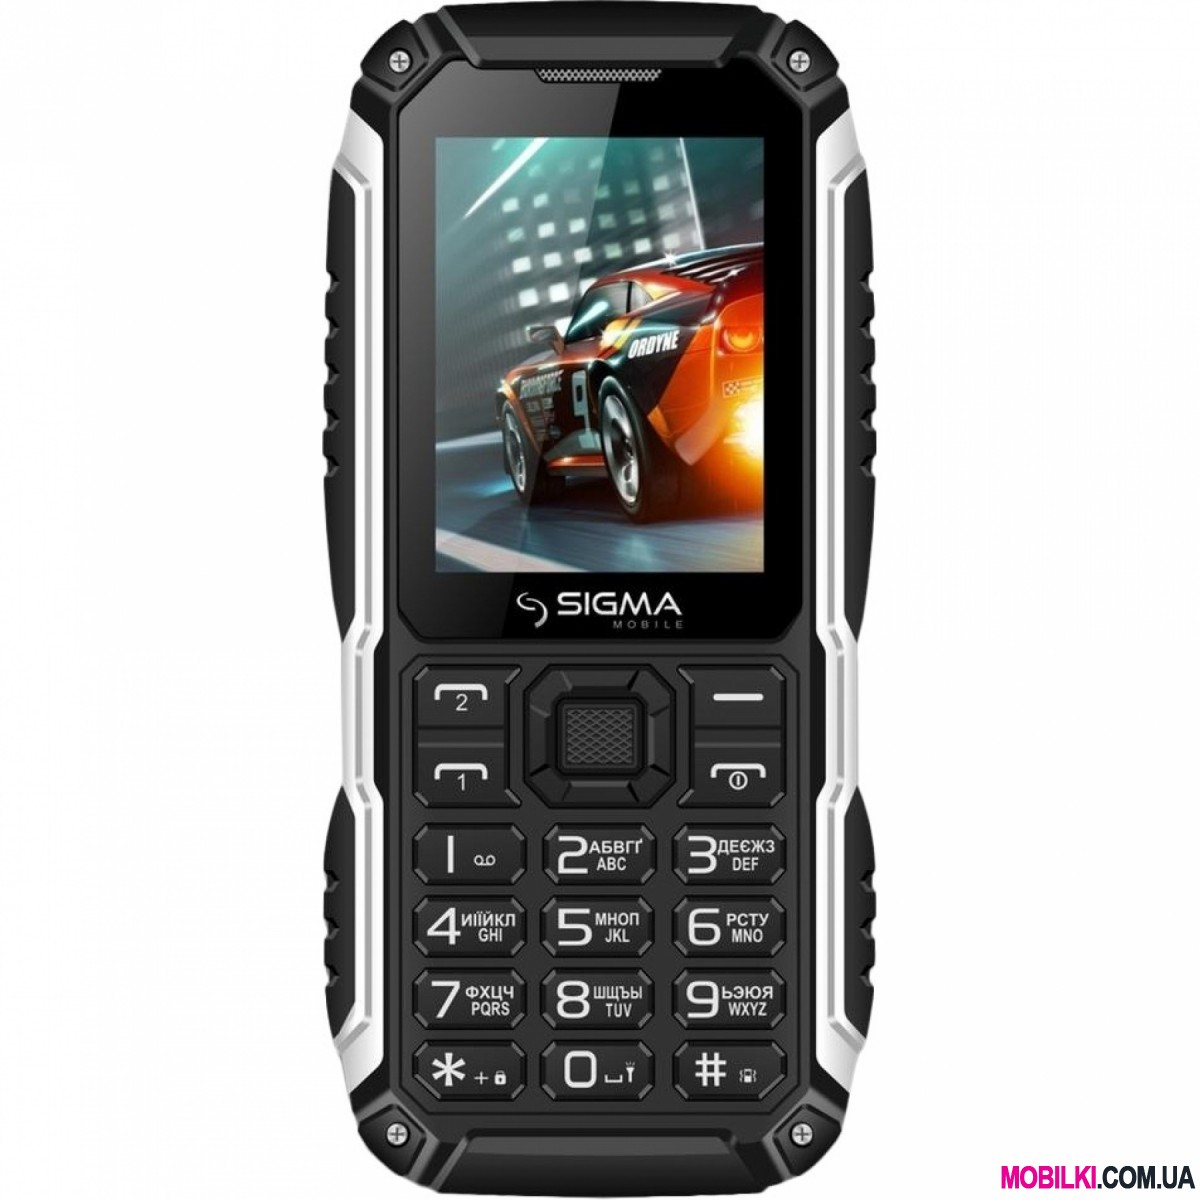 Sigma mobile X-treme PT68